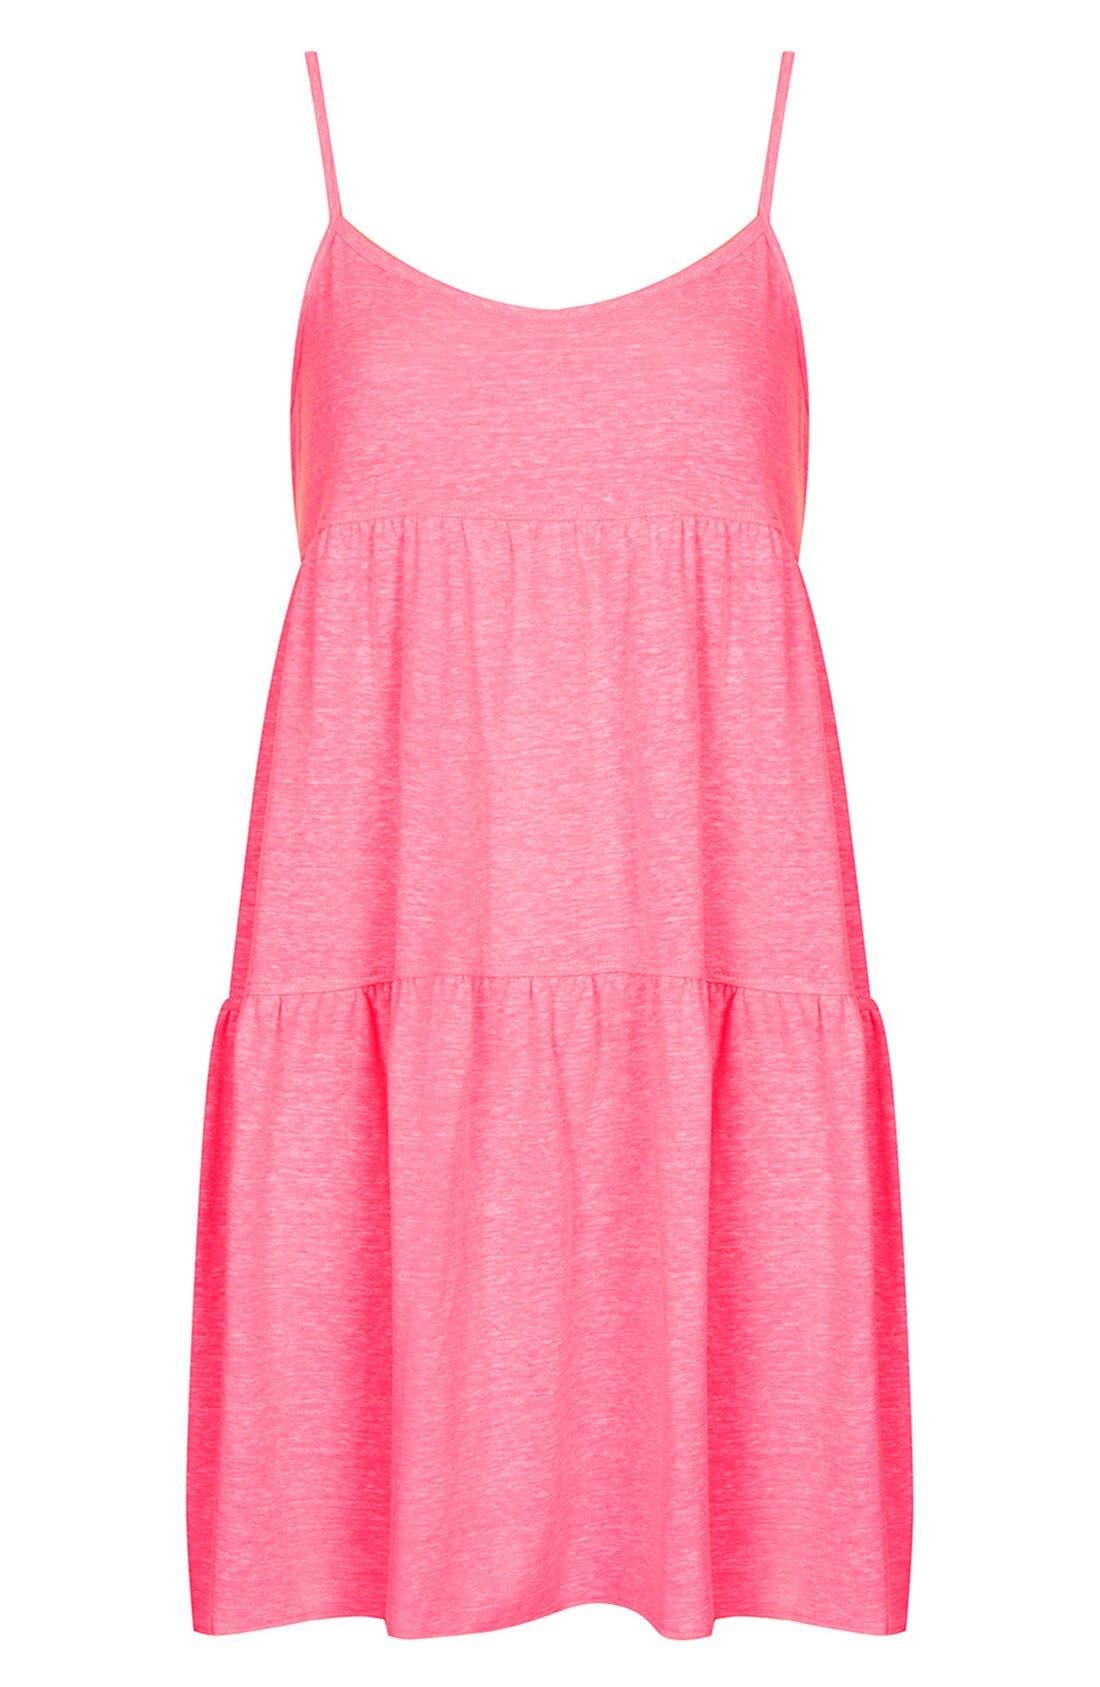 Alternate Image 3  - Topshop Tiered Slub Knit Dress